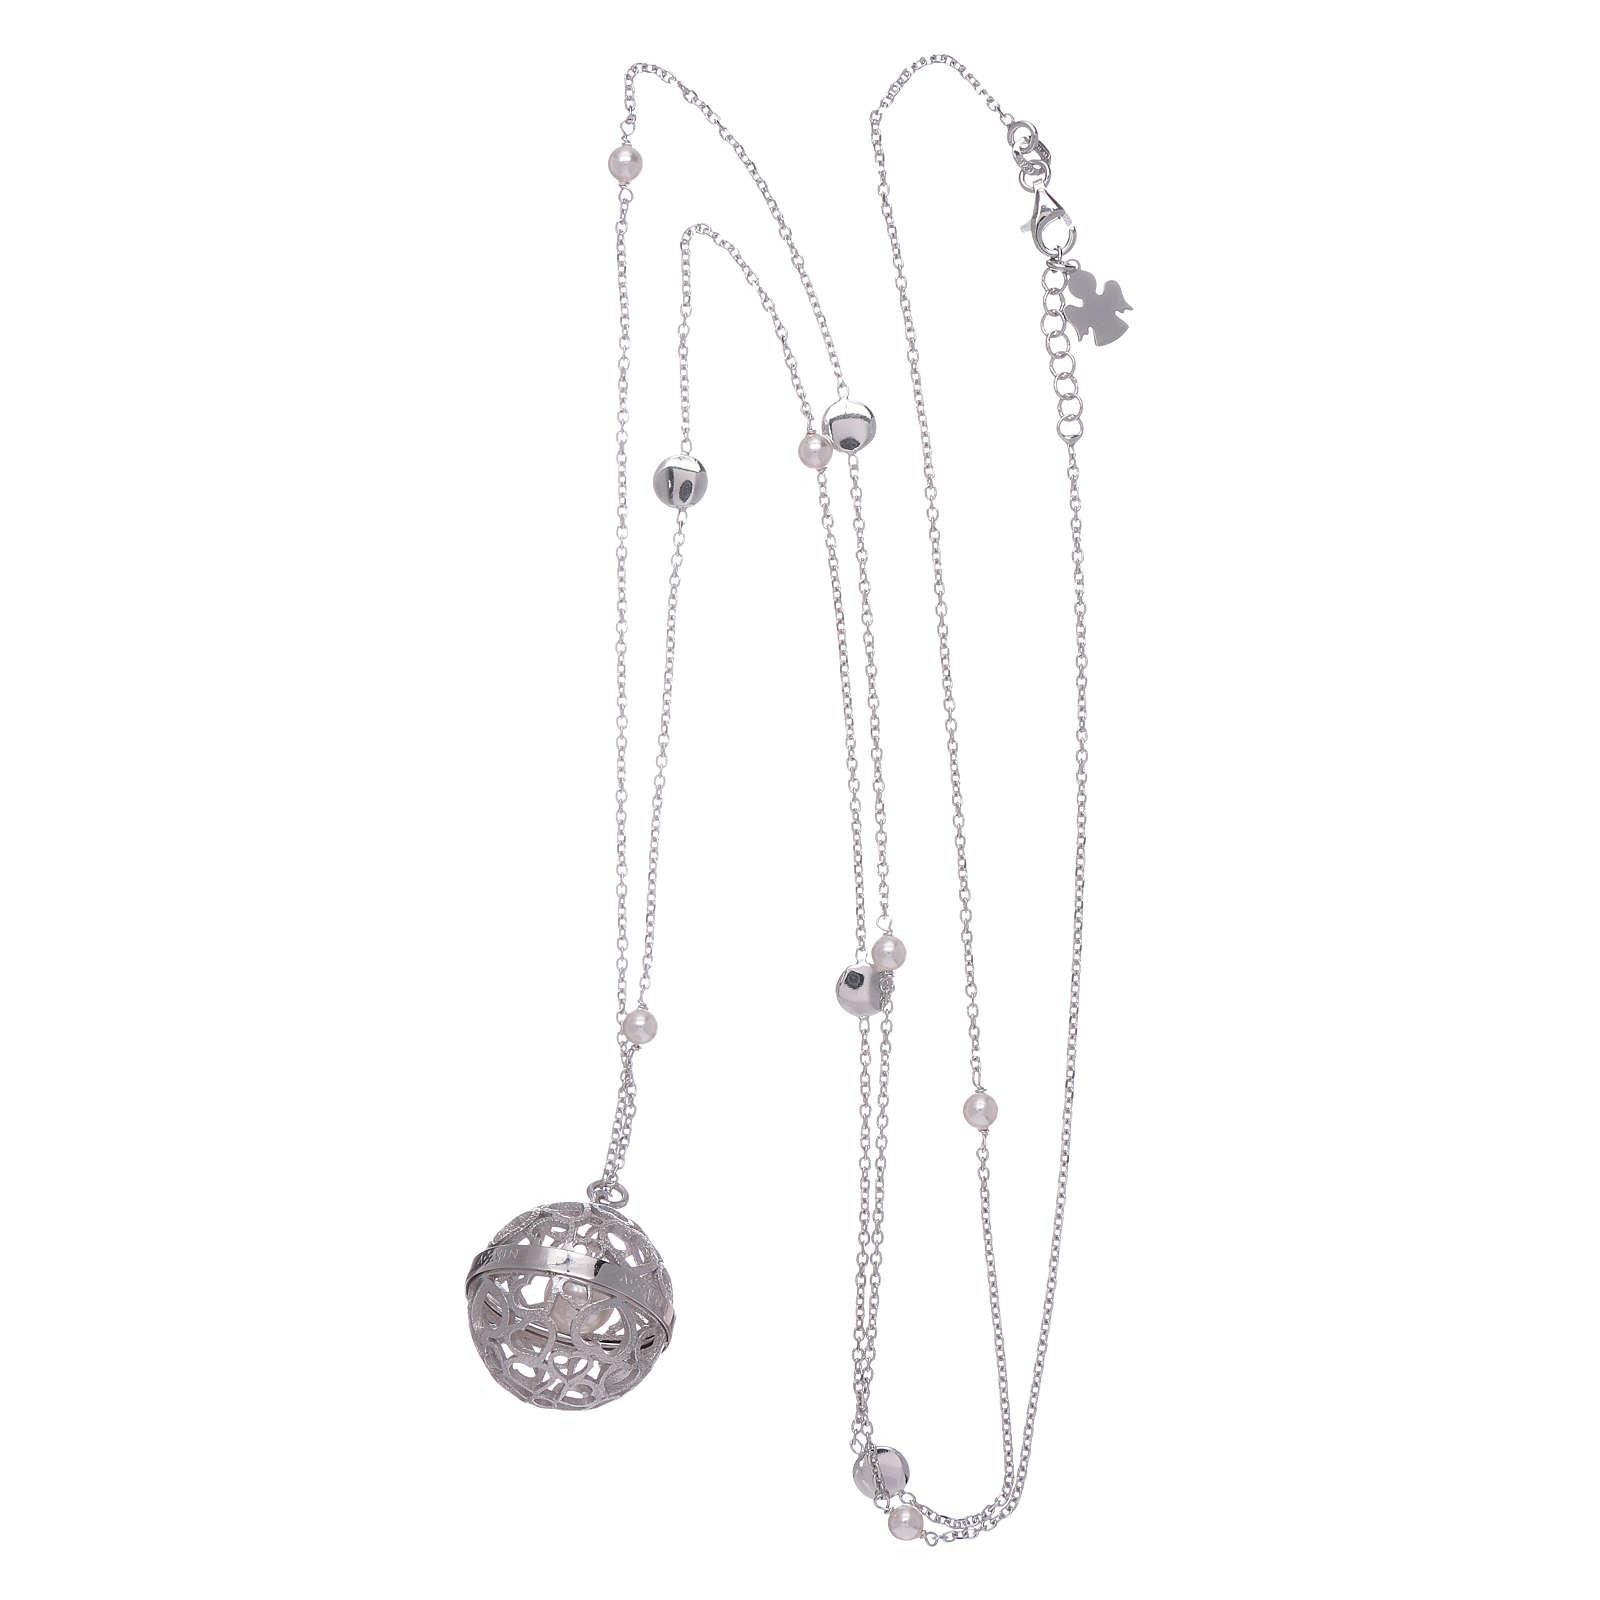 Collier AMEN grelot de grossesse argent 925 et perles 4